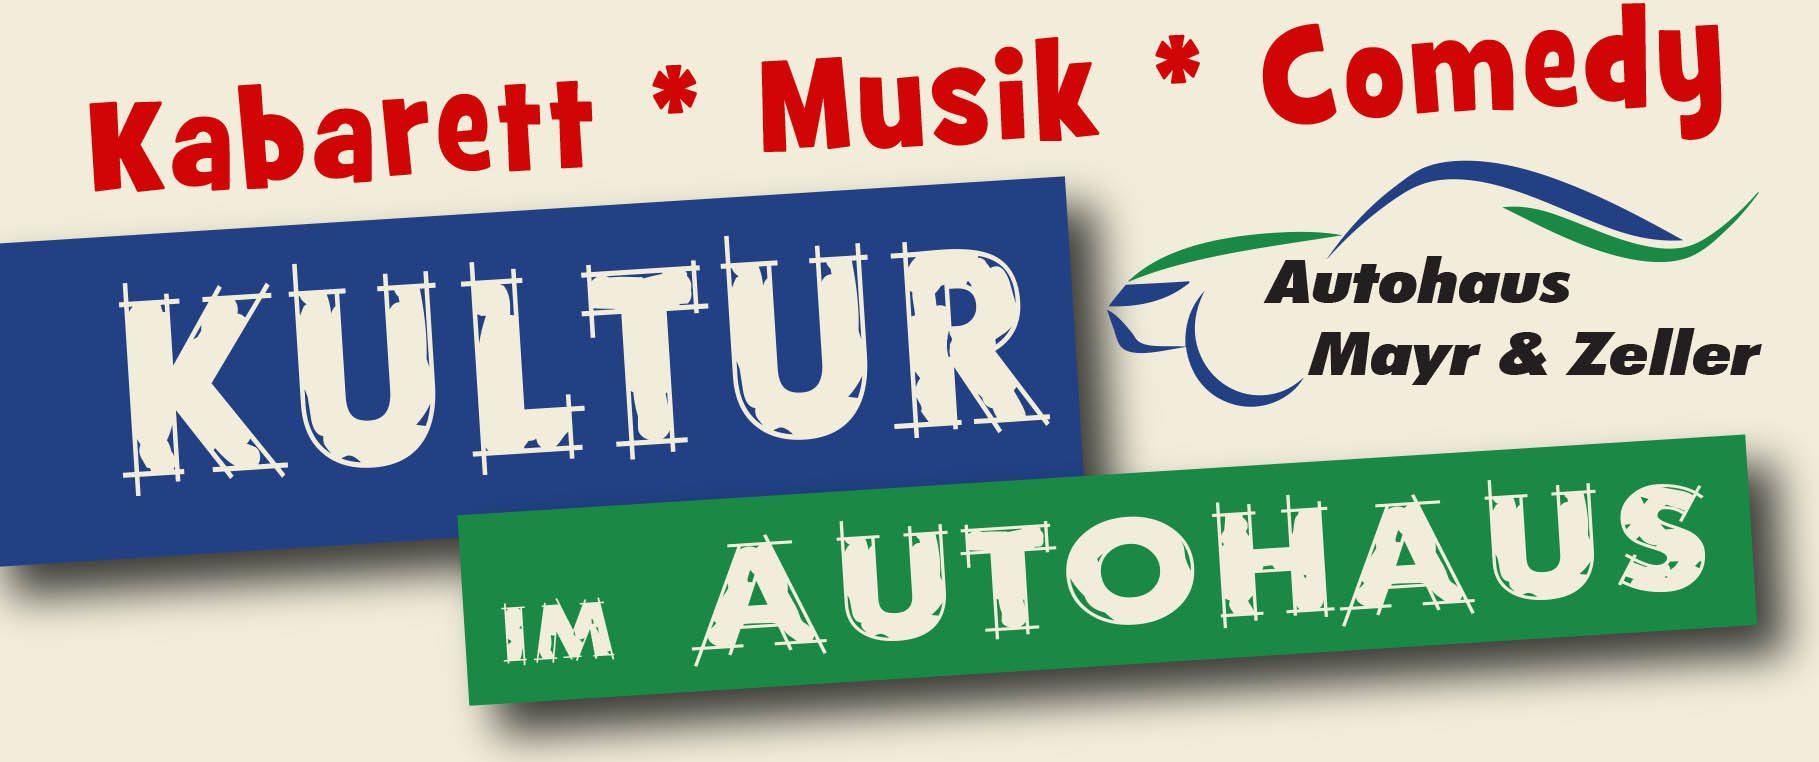 Kulturautohaus